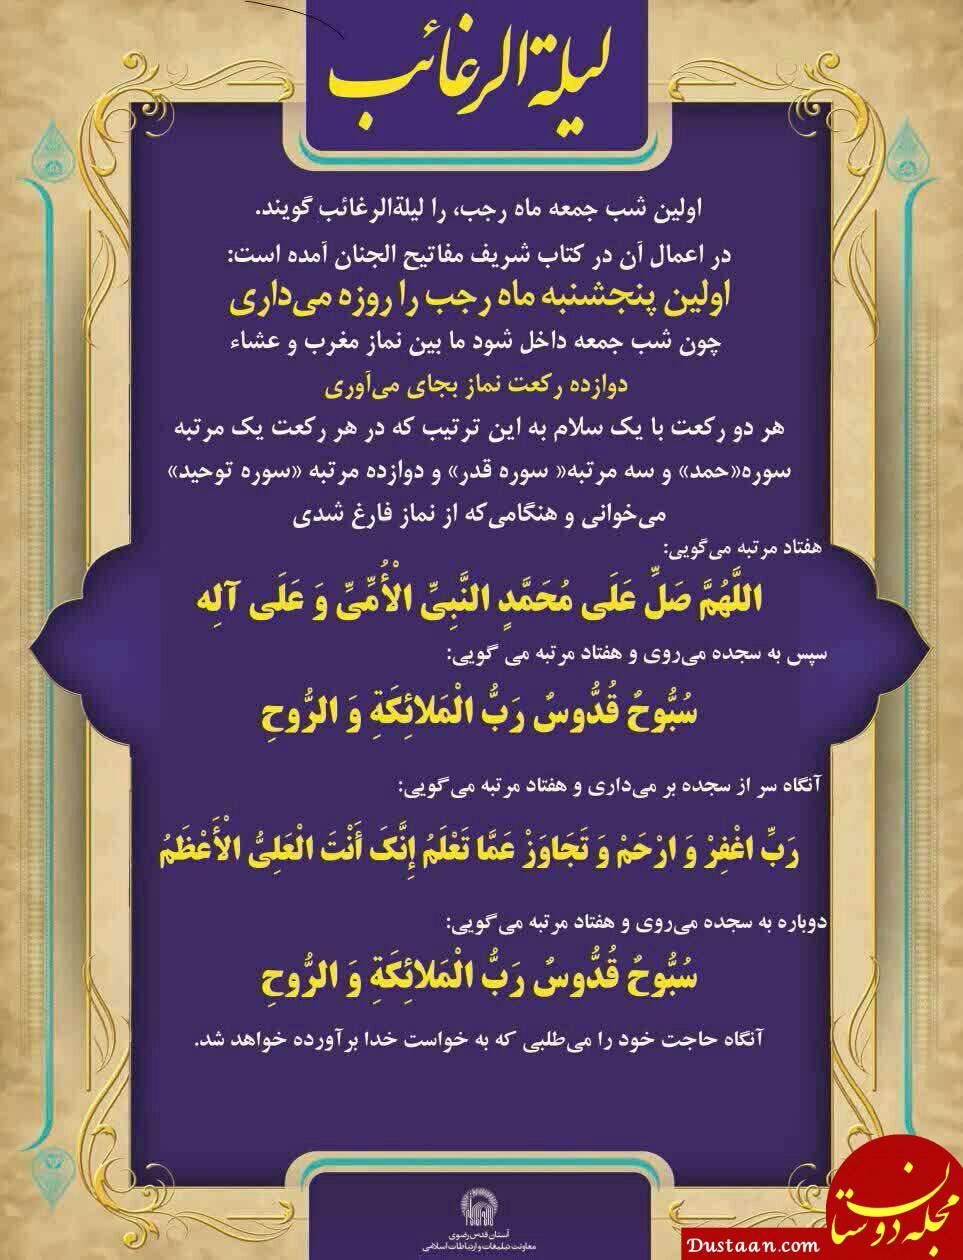 www.dustaan.com اعمال لیله الرغائب و فضیلت شب آرزوها